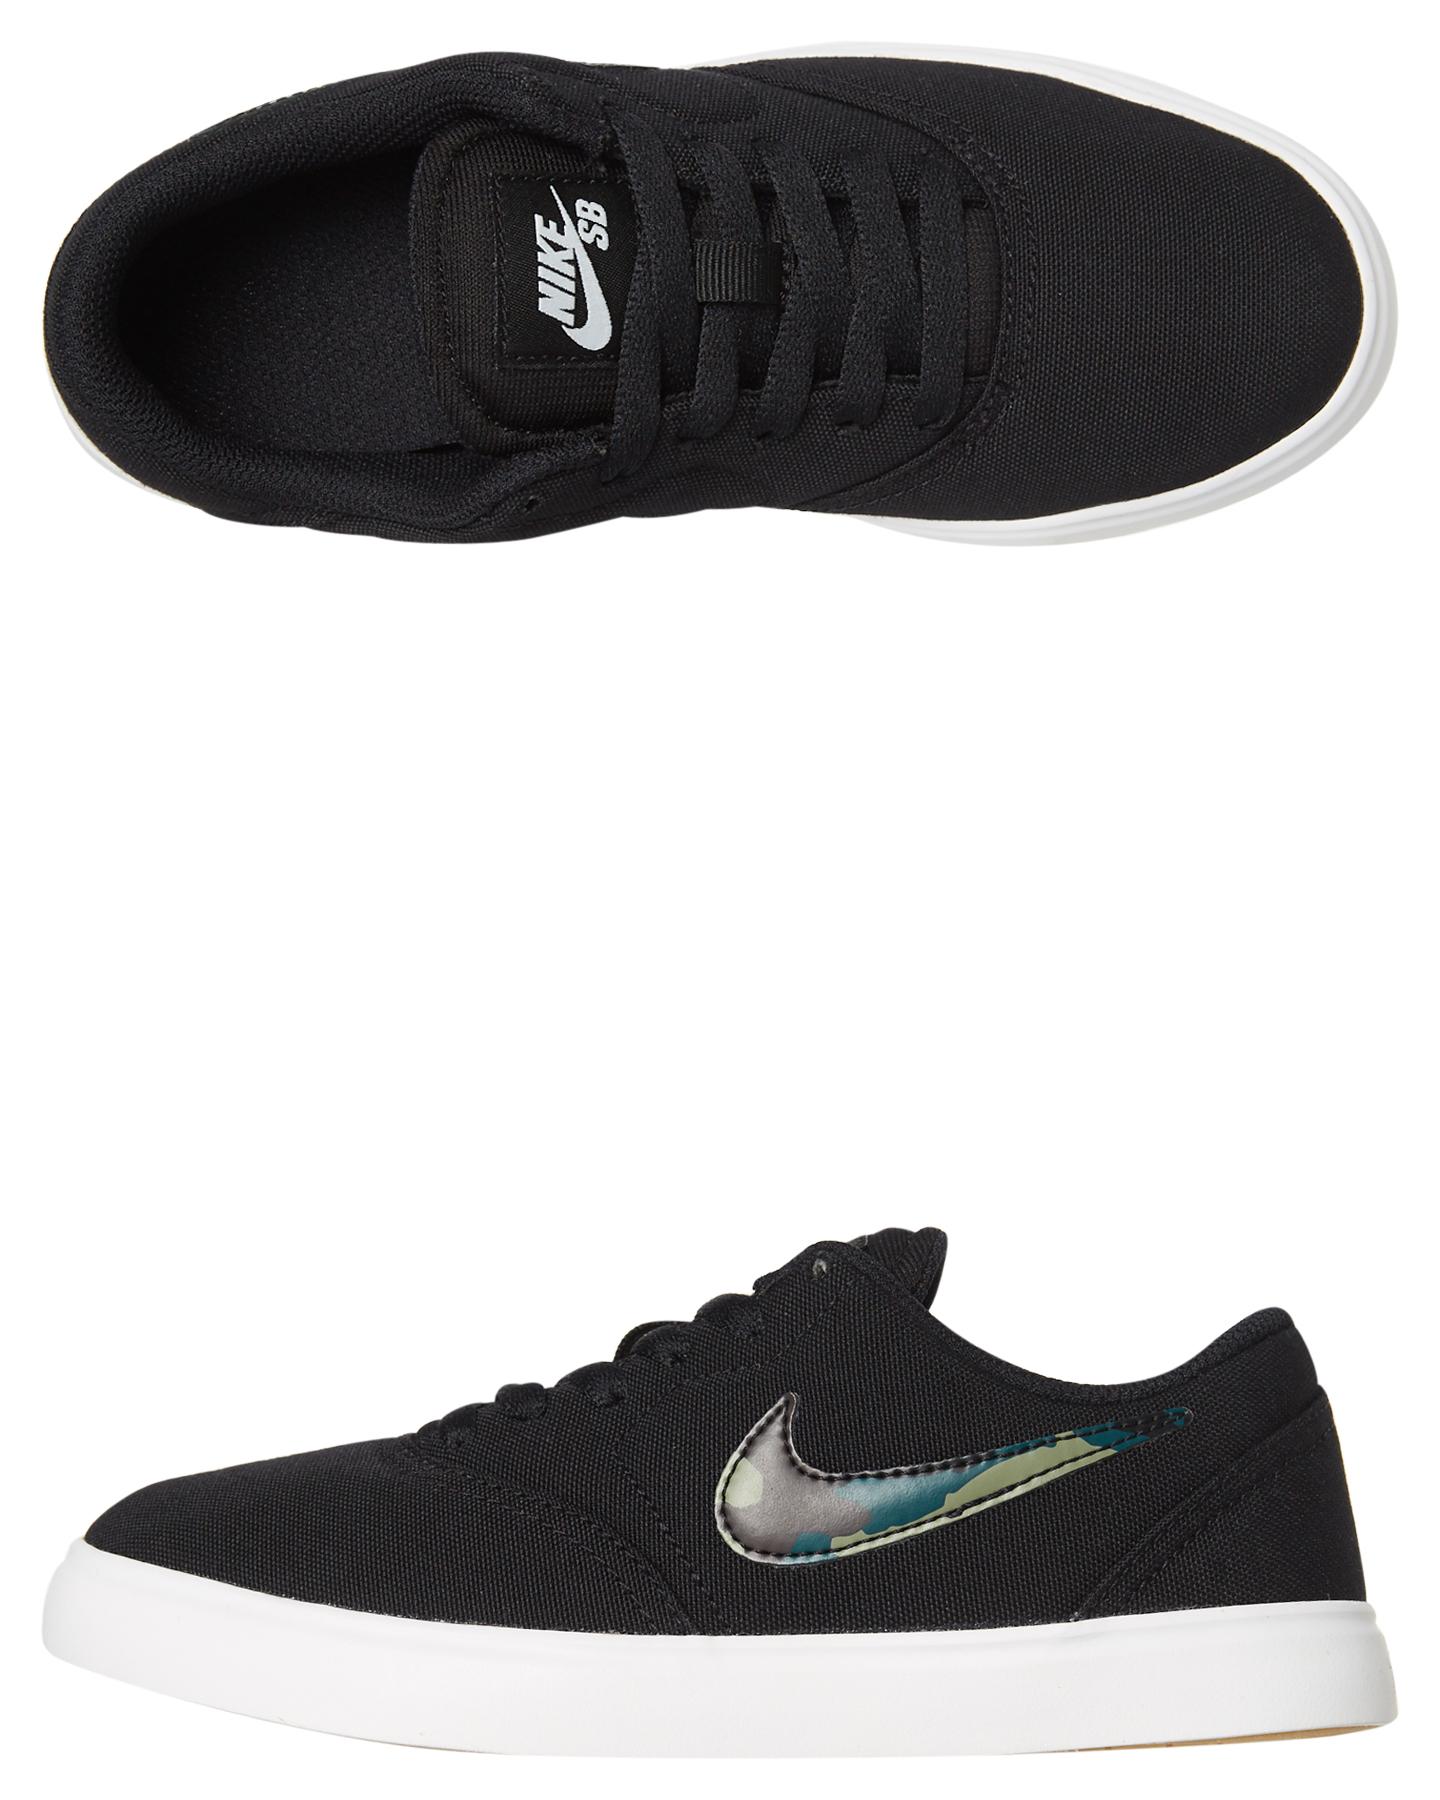 Nike Kids Boys Sb Check Canvas Shoe Black Olive Shoes Size 7 ... 60597bbe6e22